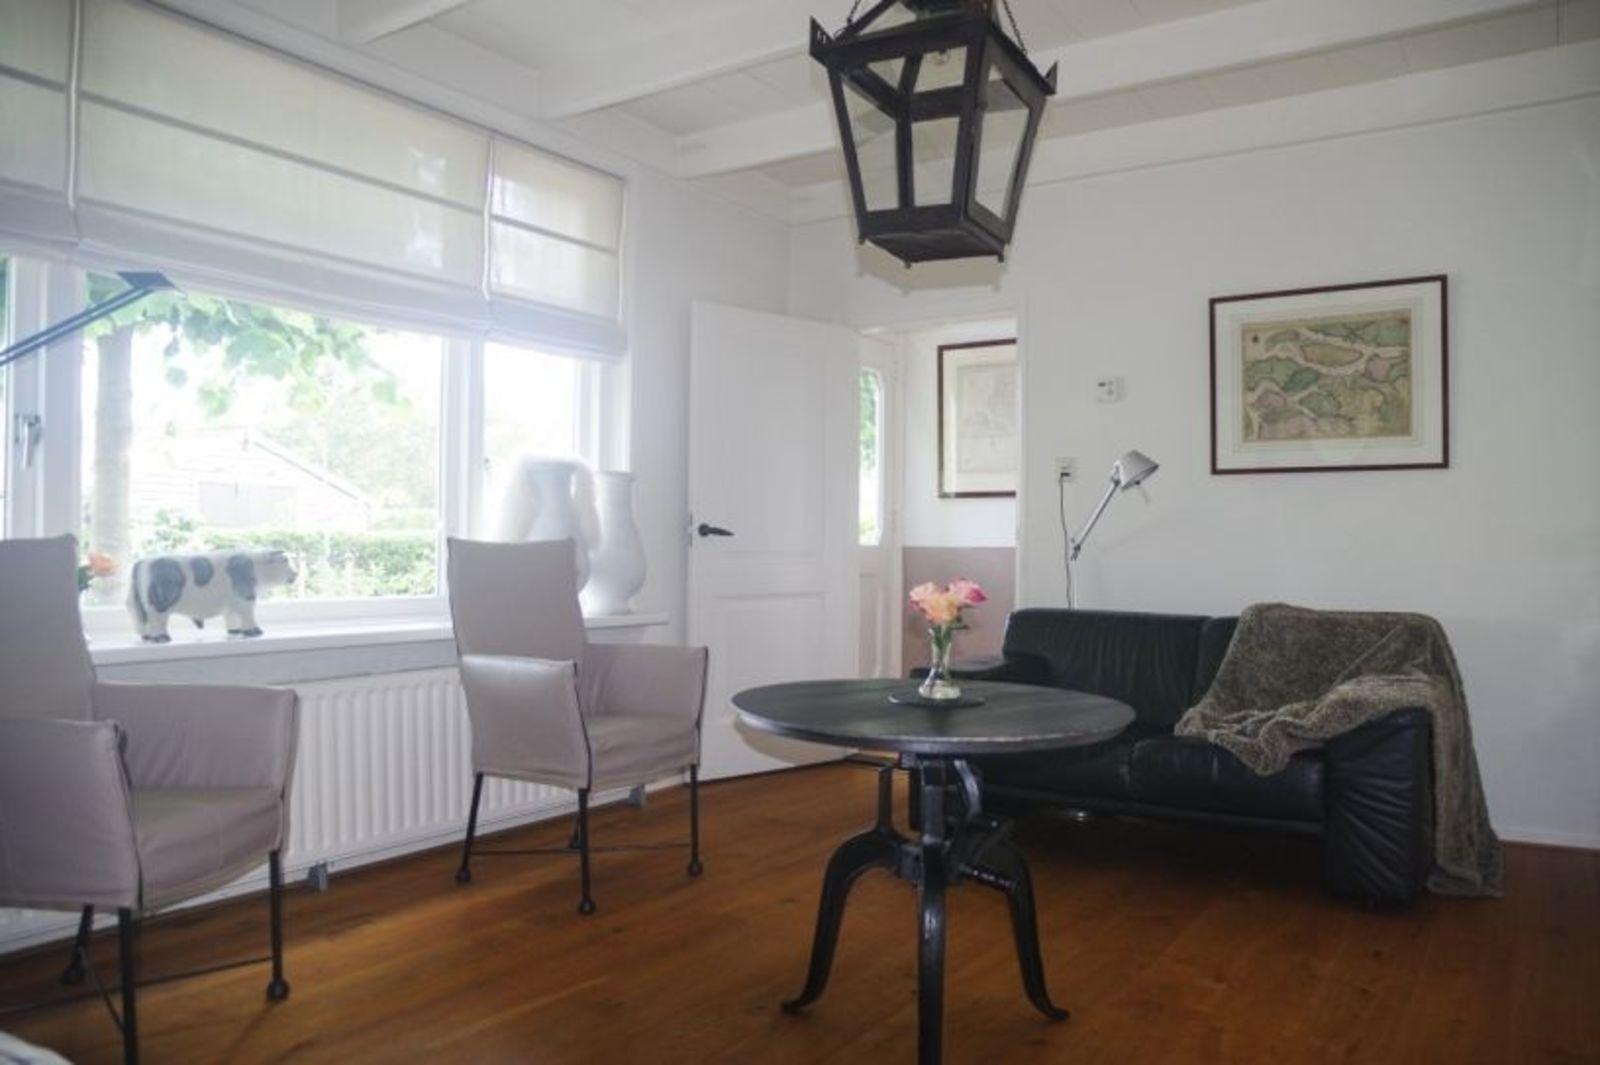 Vakantiehuis Dijkstelweg 30 (4 personen) - Ouddorp